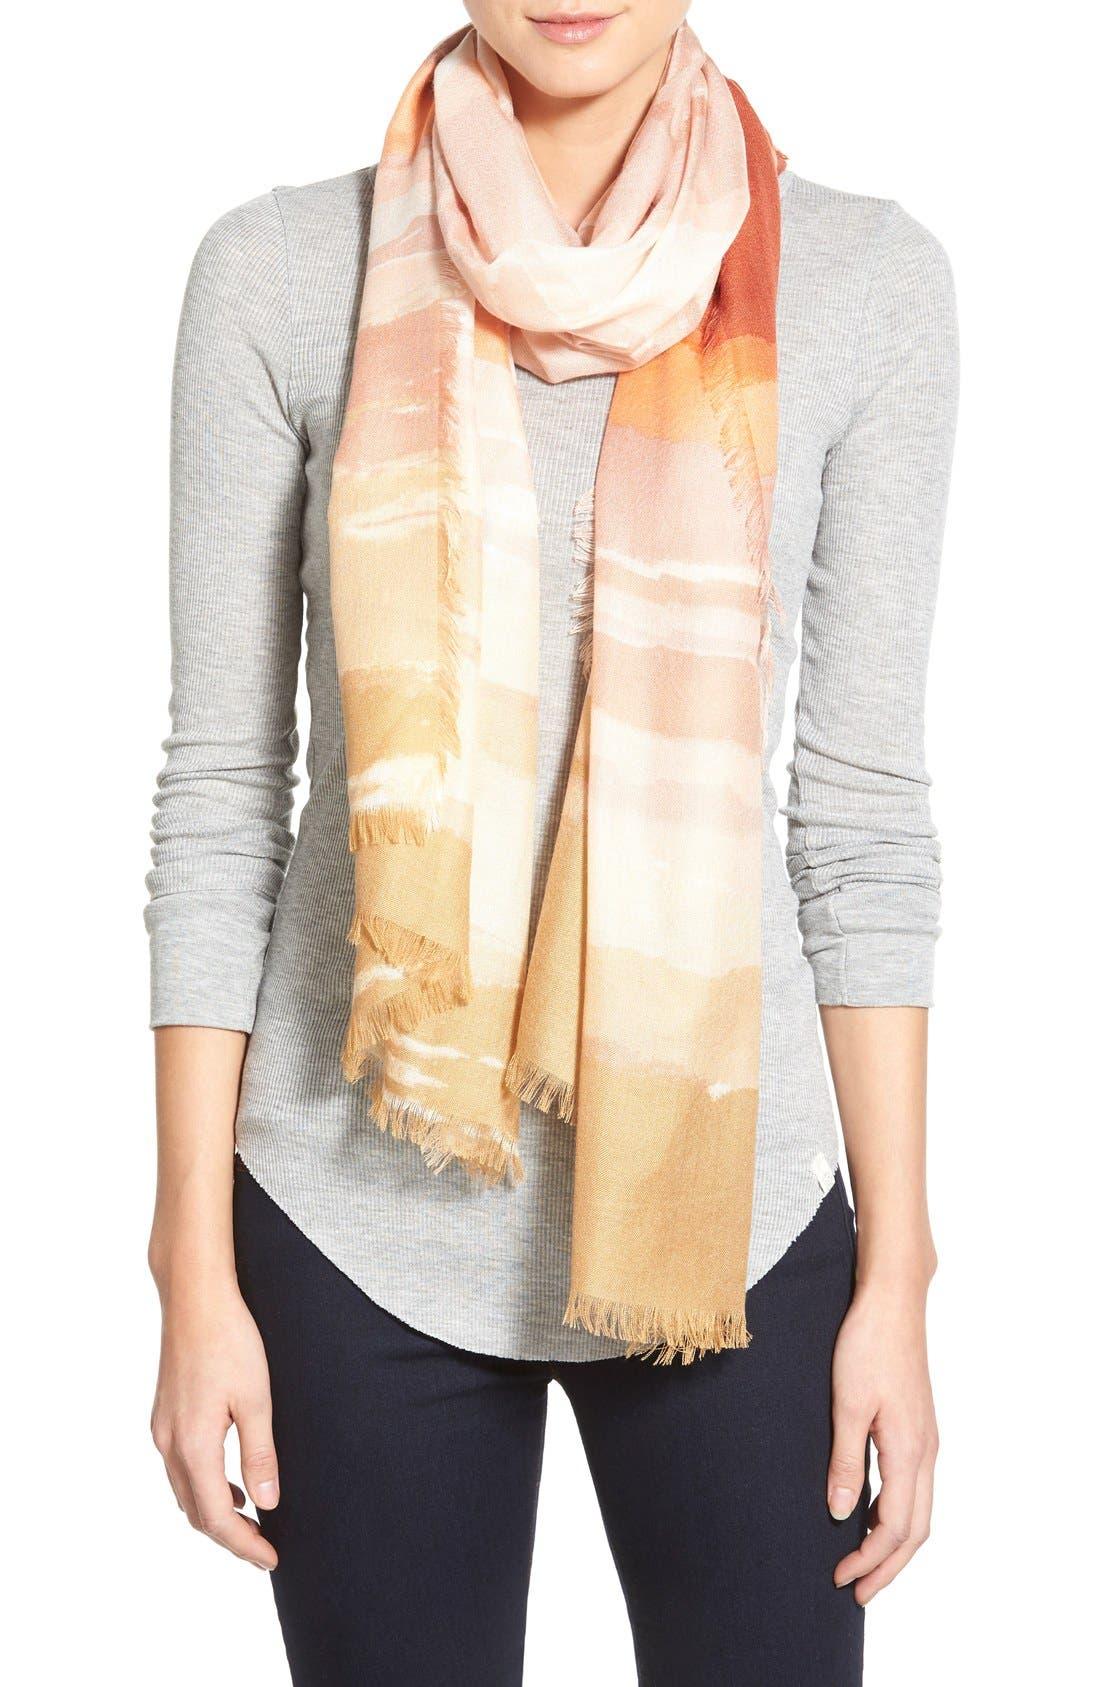 Main Image - Nordstrom 'Watercolor Block' Cashmere & Silk Scarf